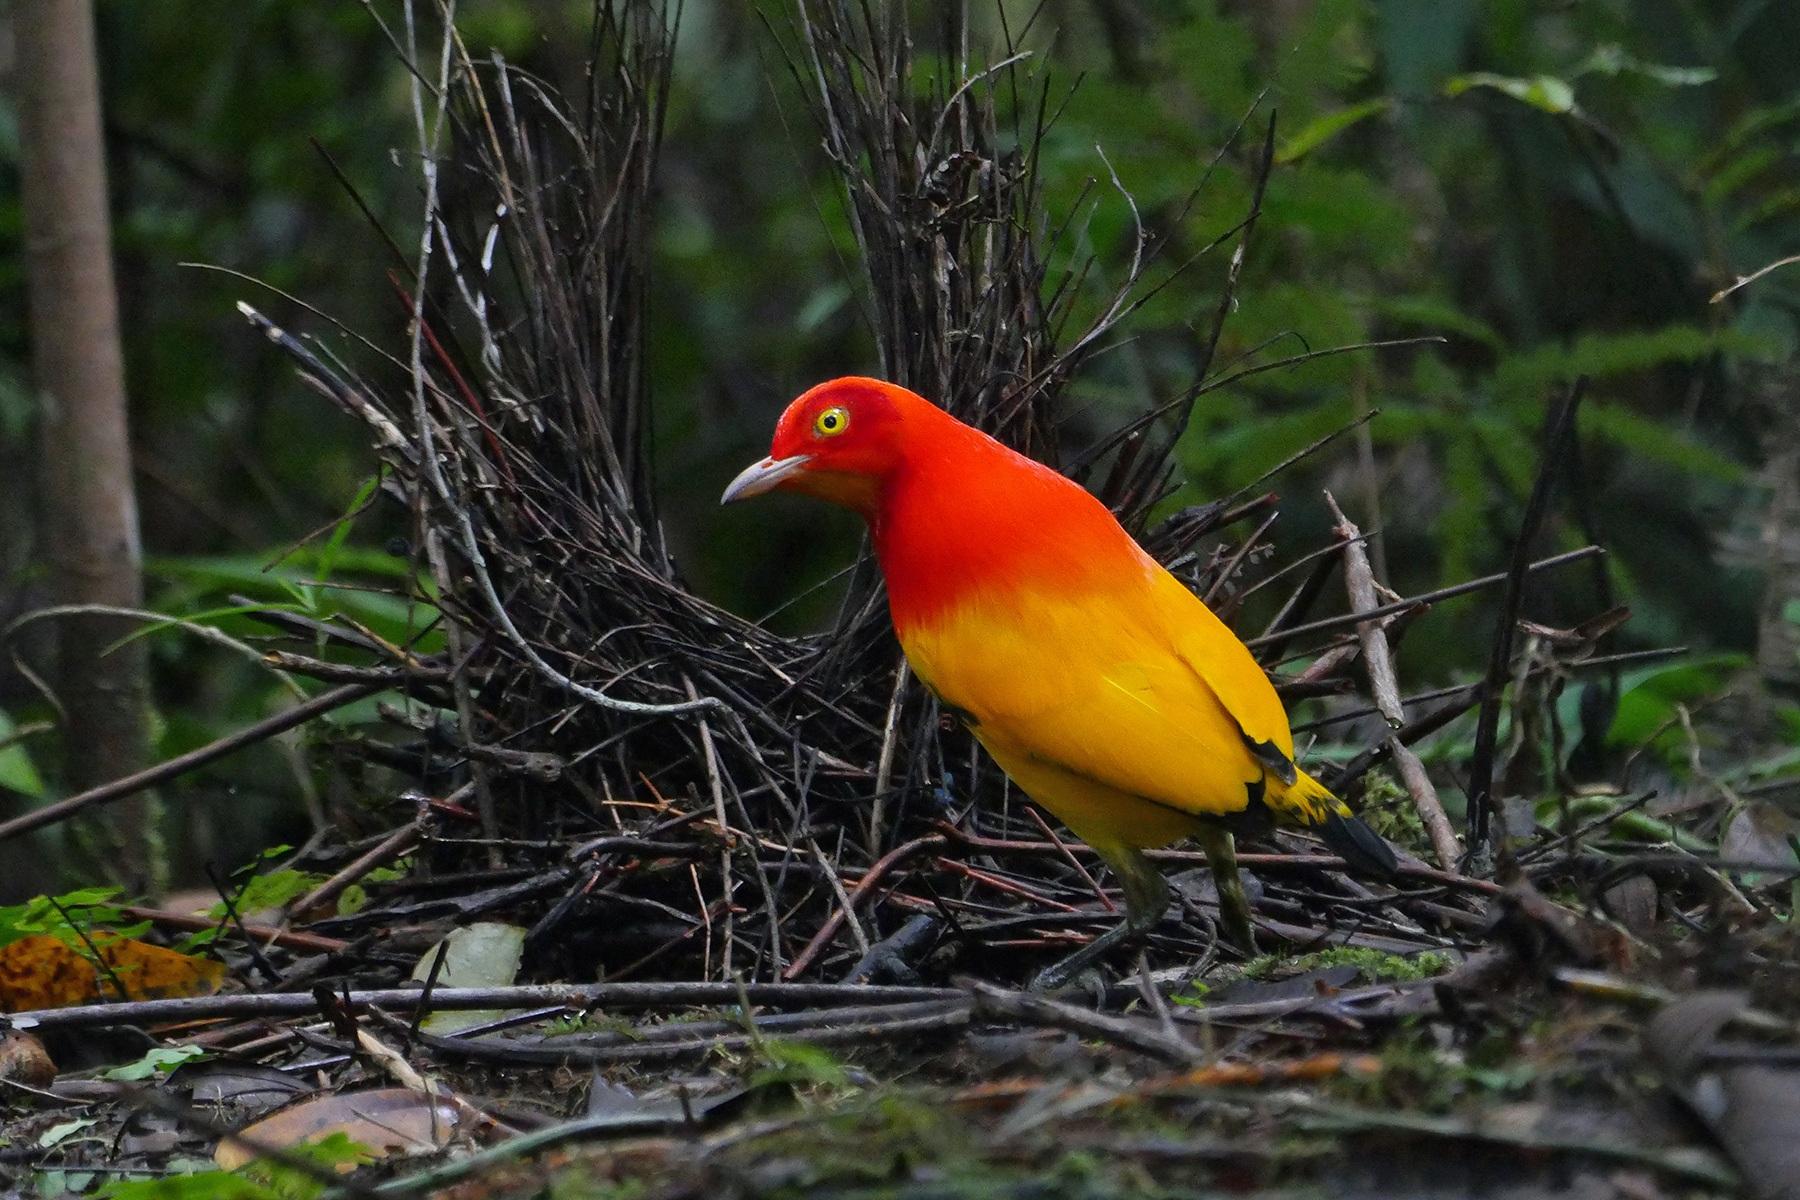 Papua New Guinea Birding Tours - Birdwatching Tours - Birdquest